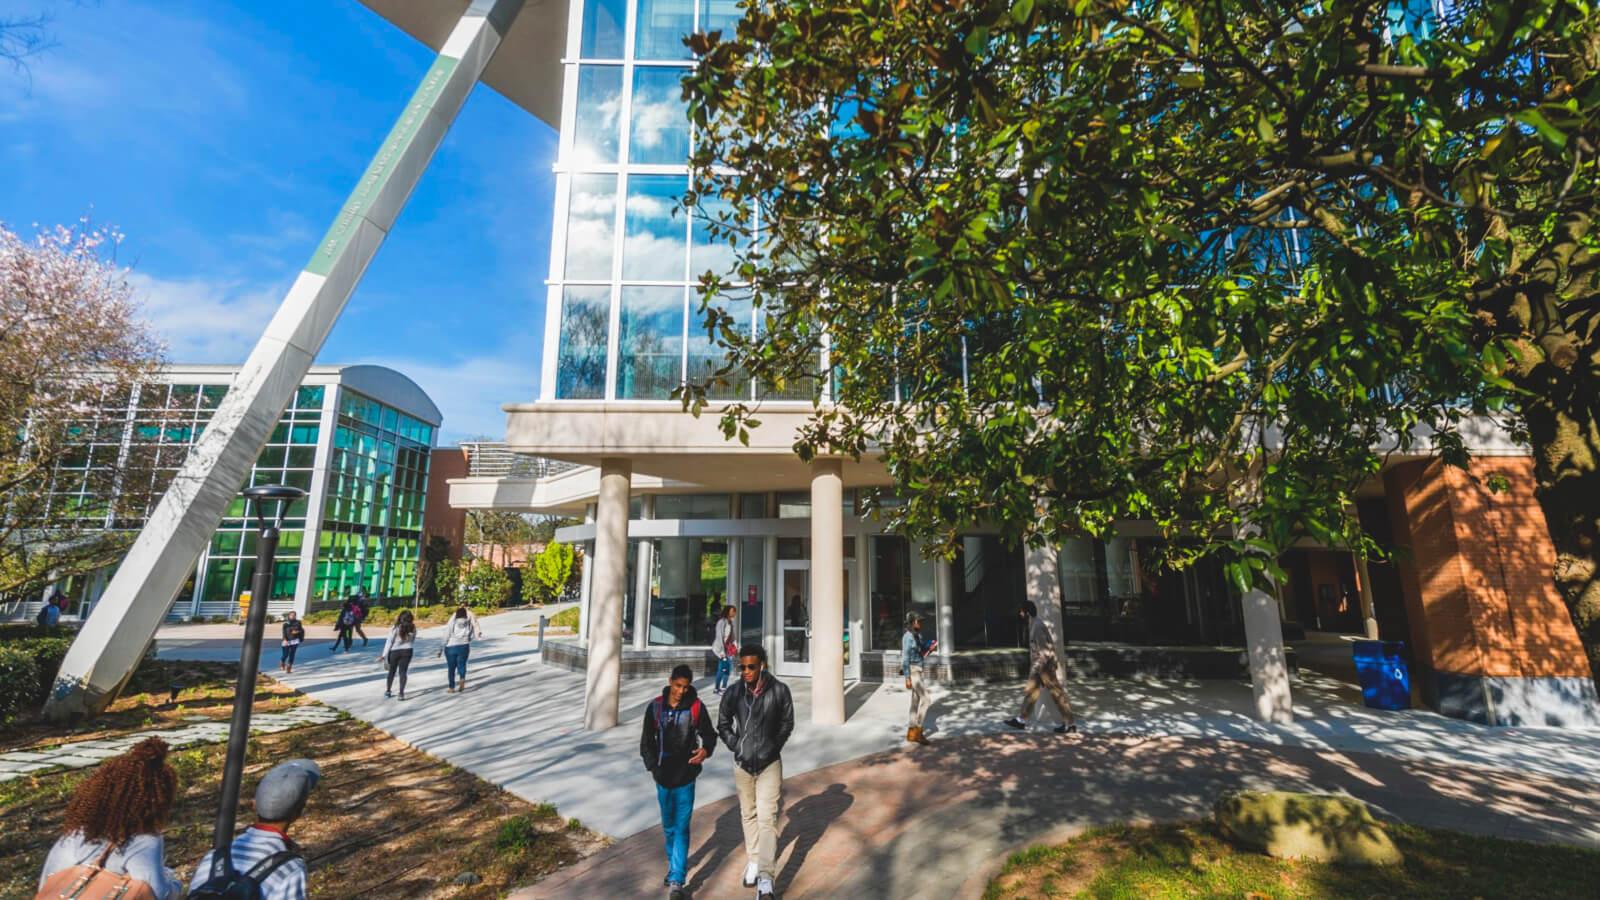 Georgia State University-Perimeter College